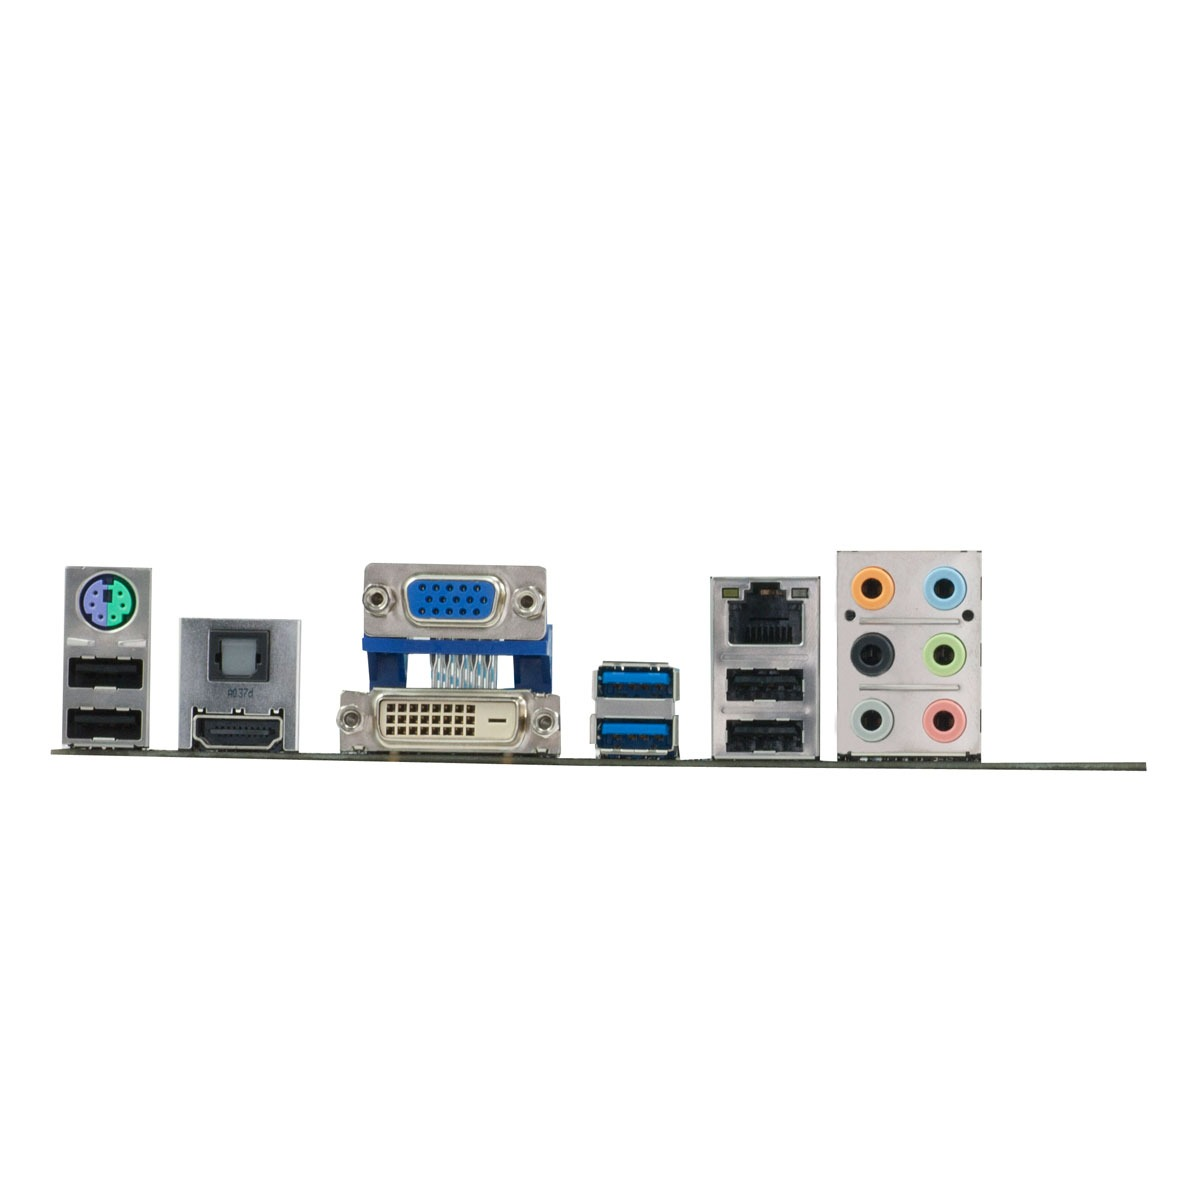 Carte mère ASUS P8H67-V Carte mère ATX Socket 1155 Intel H67 Express Revision B3 (garantie 3 ans)